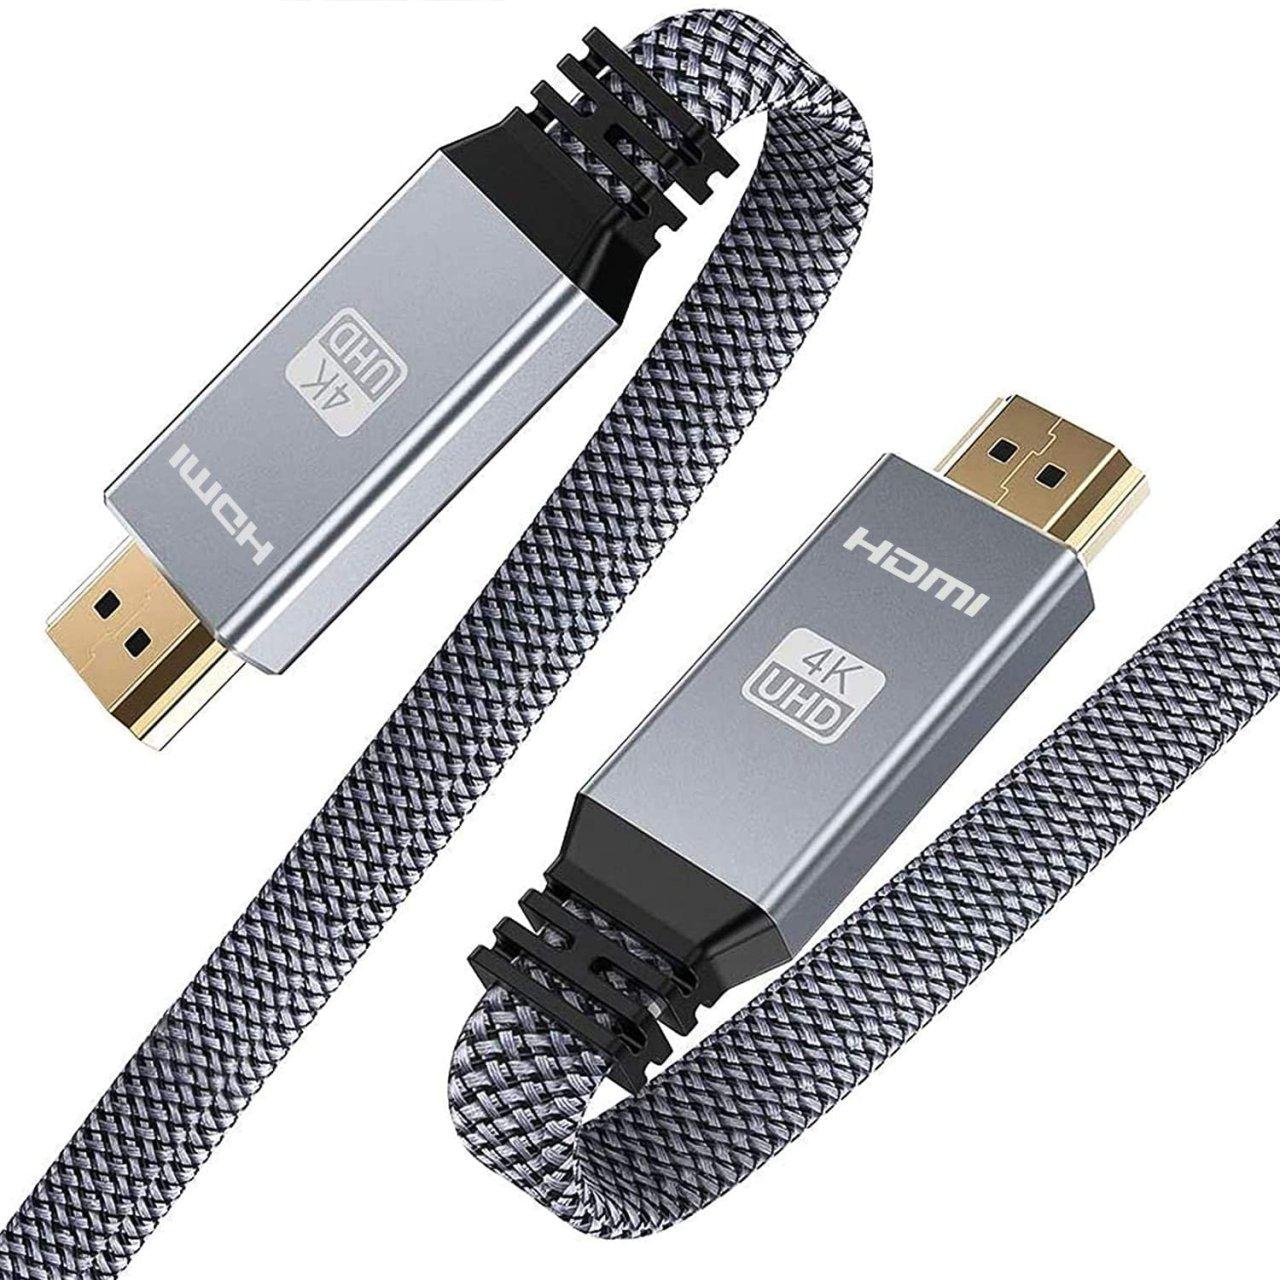 HDMI Kabel 2 Meter 4K HDMI Flach 2.0 Kabel 4K@60Hz Highspeed